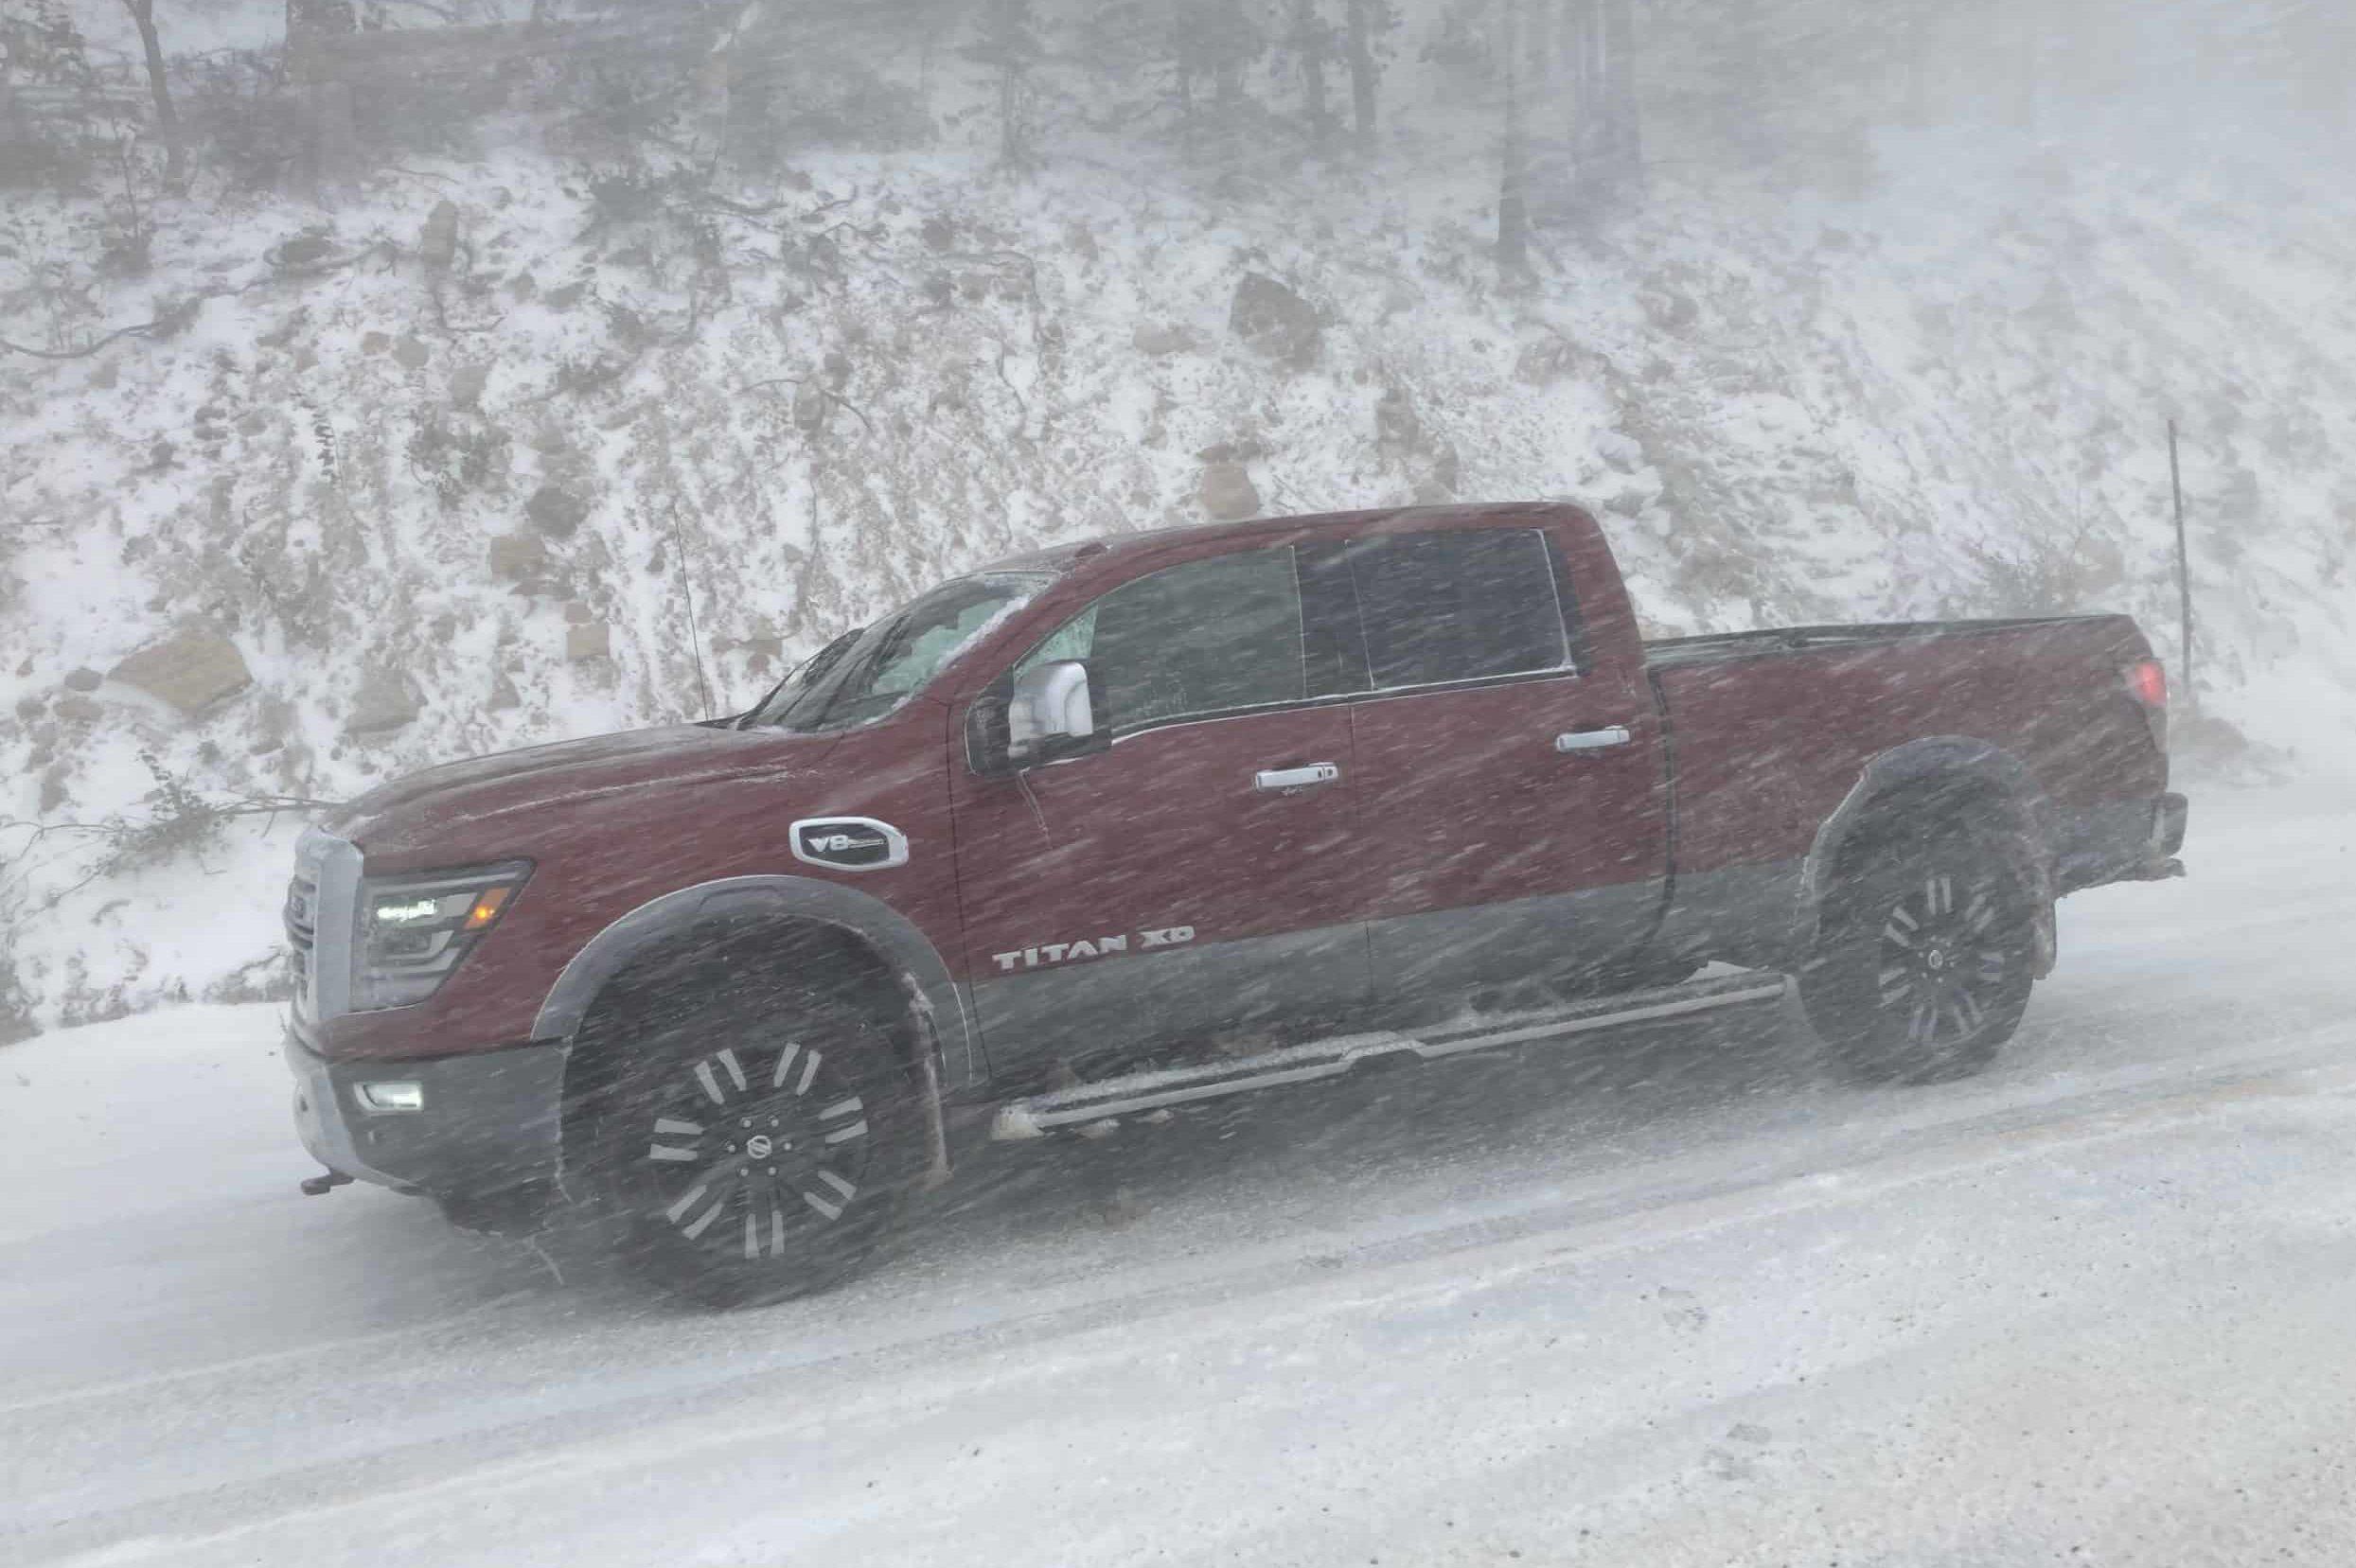 Nissan Titan XD in the snow